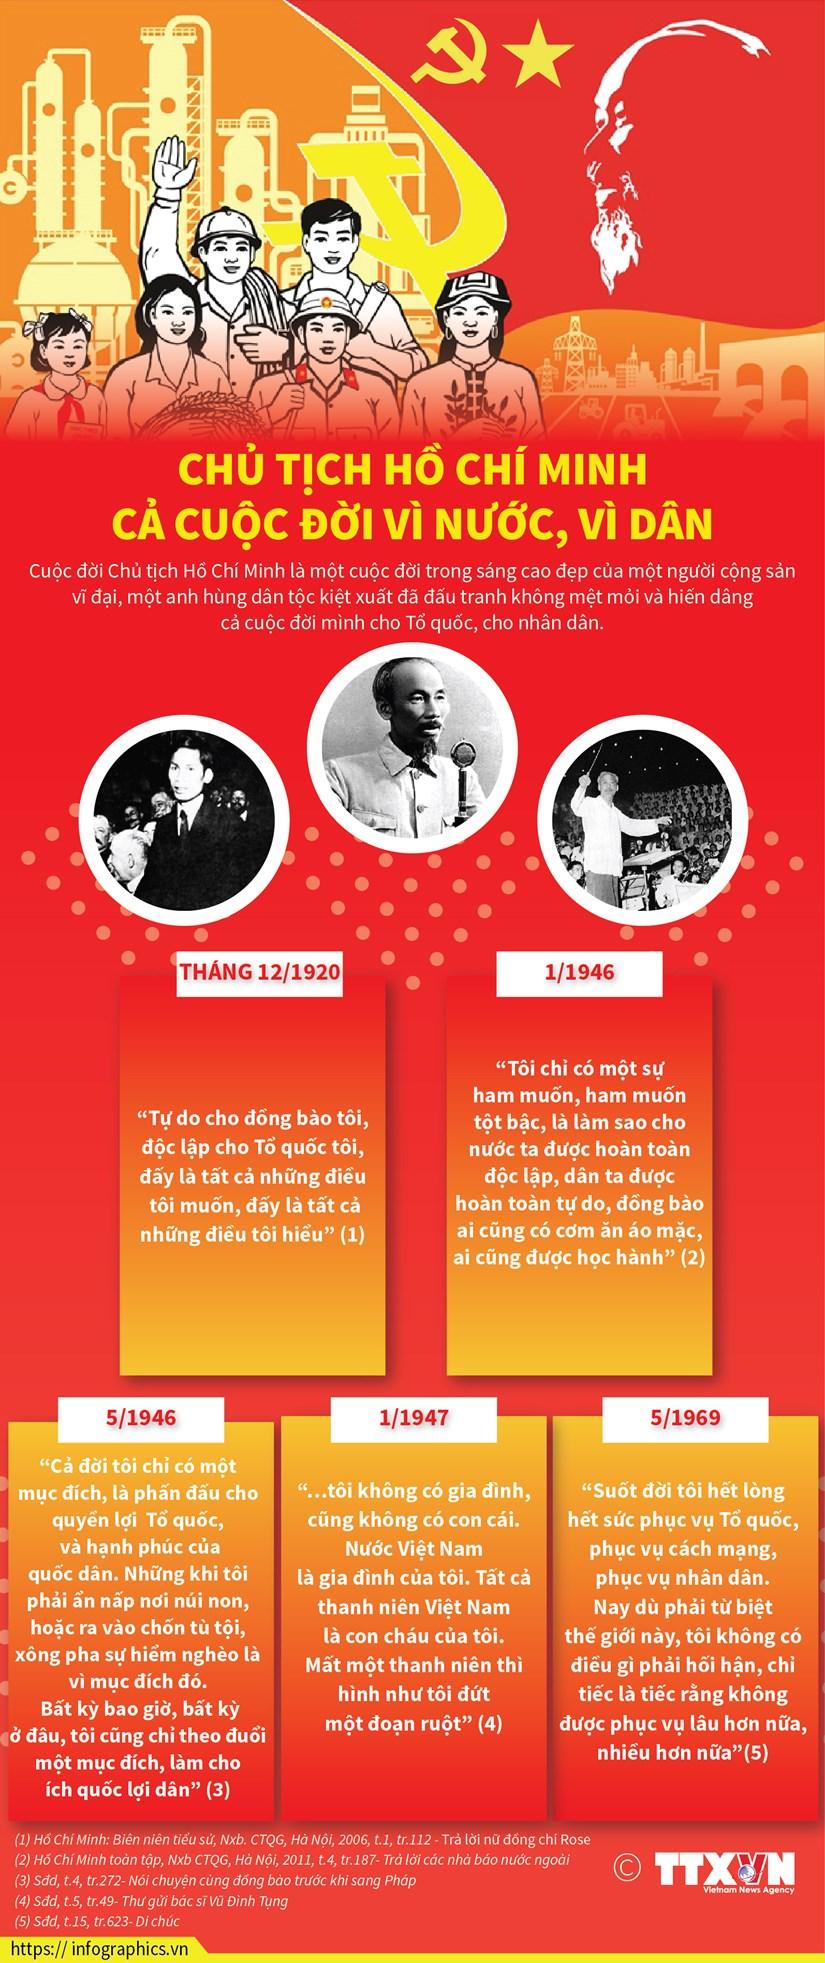 [Infographics] Chu tich Ho Chi Minh - Ca cuoc doi vi nuoc, vi dan hinh anh 1